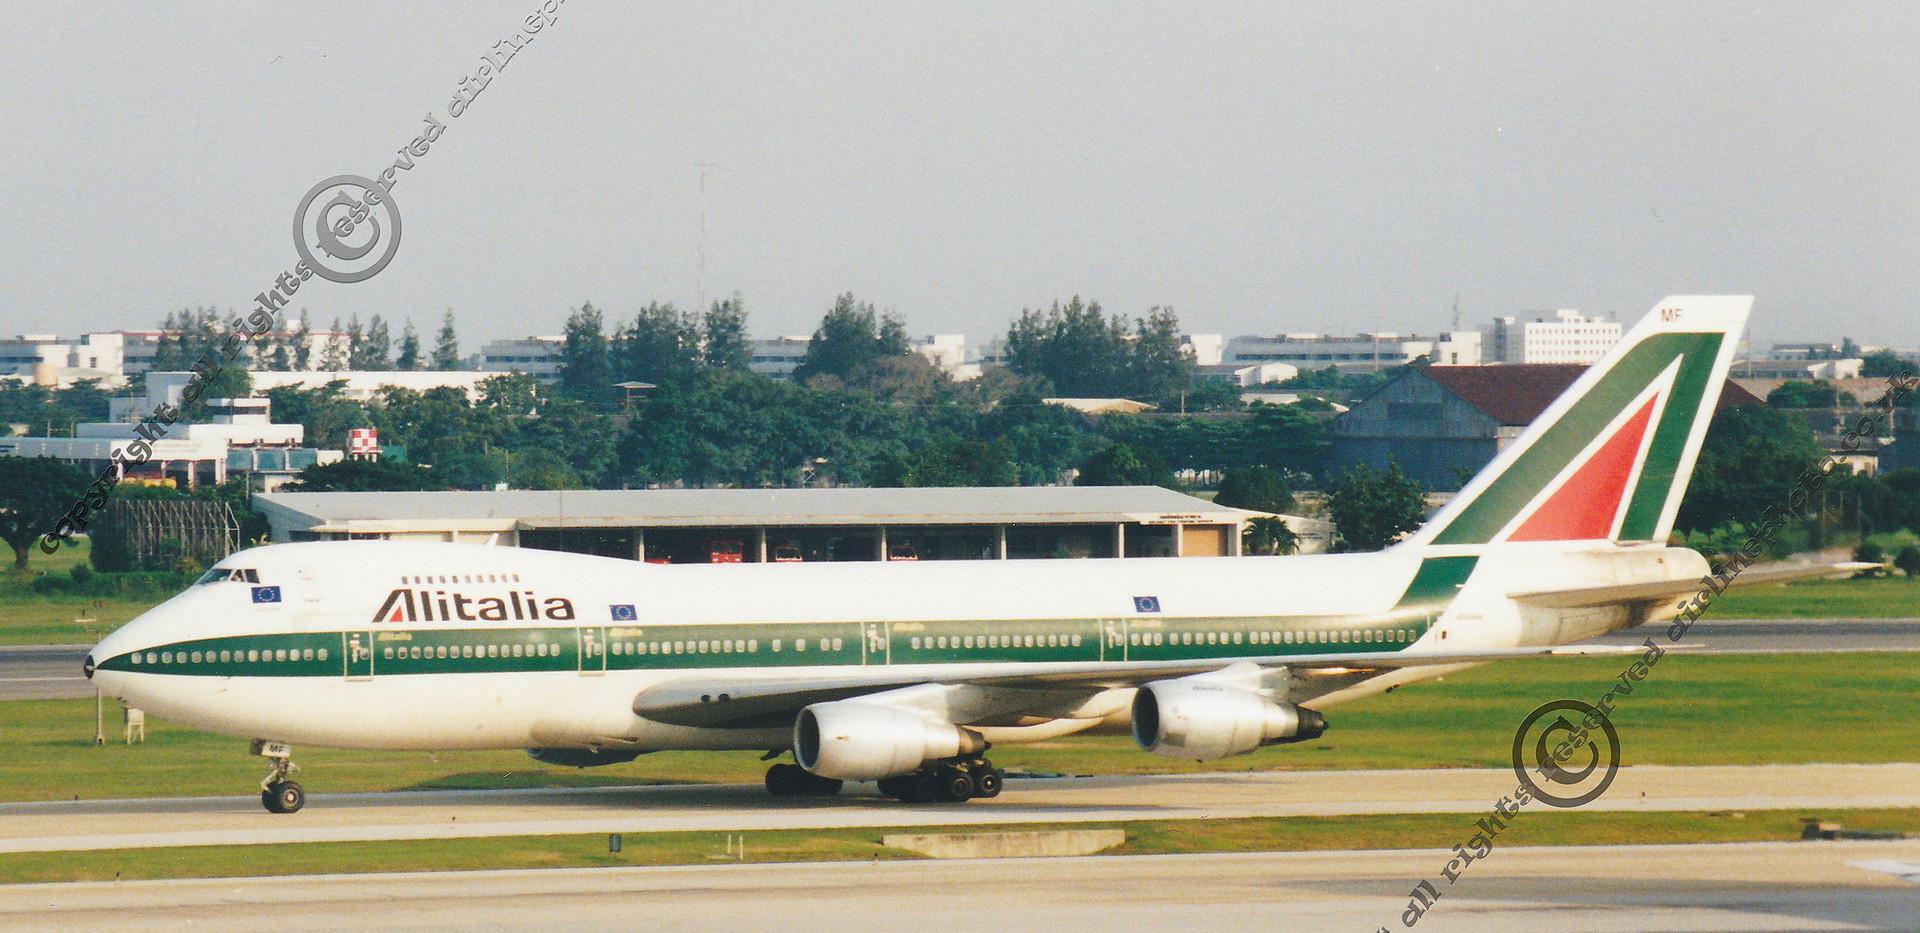 I-DEMF-Alitalia-Boeing-747-CPH-1994.jpg